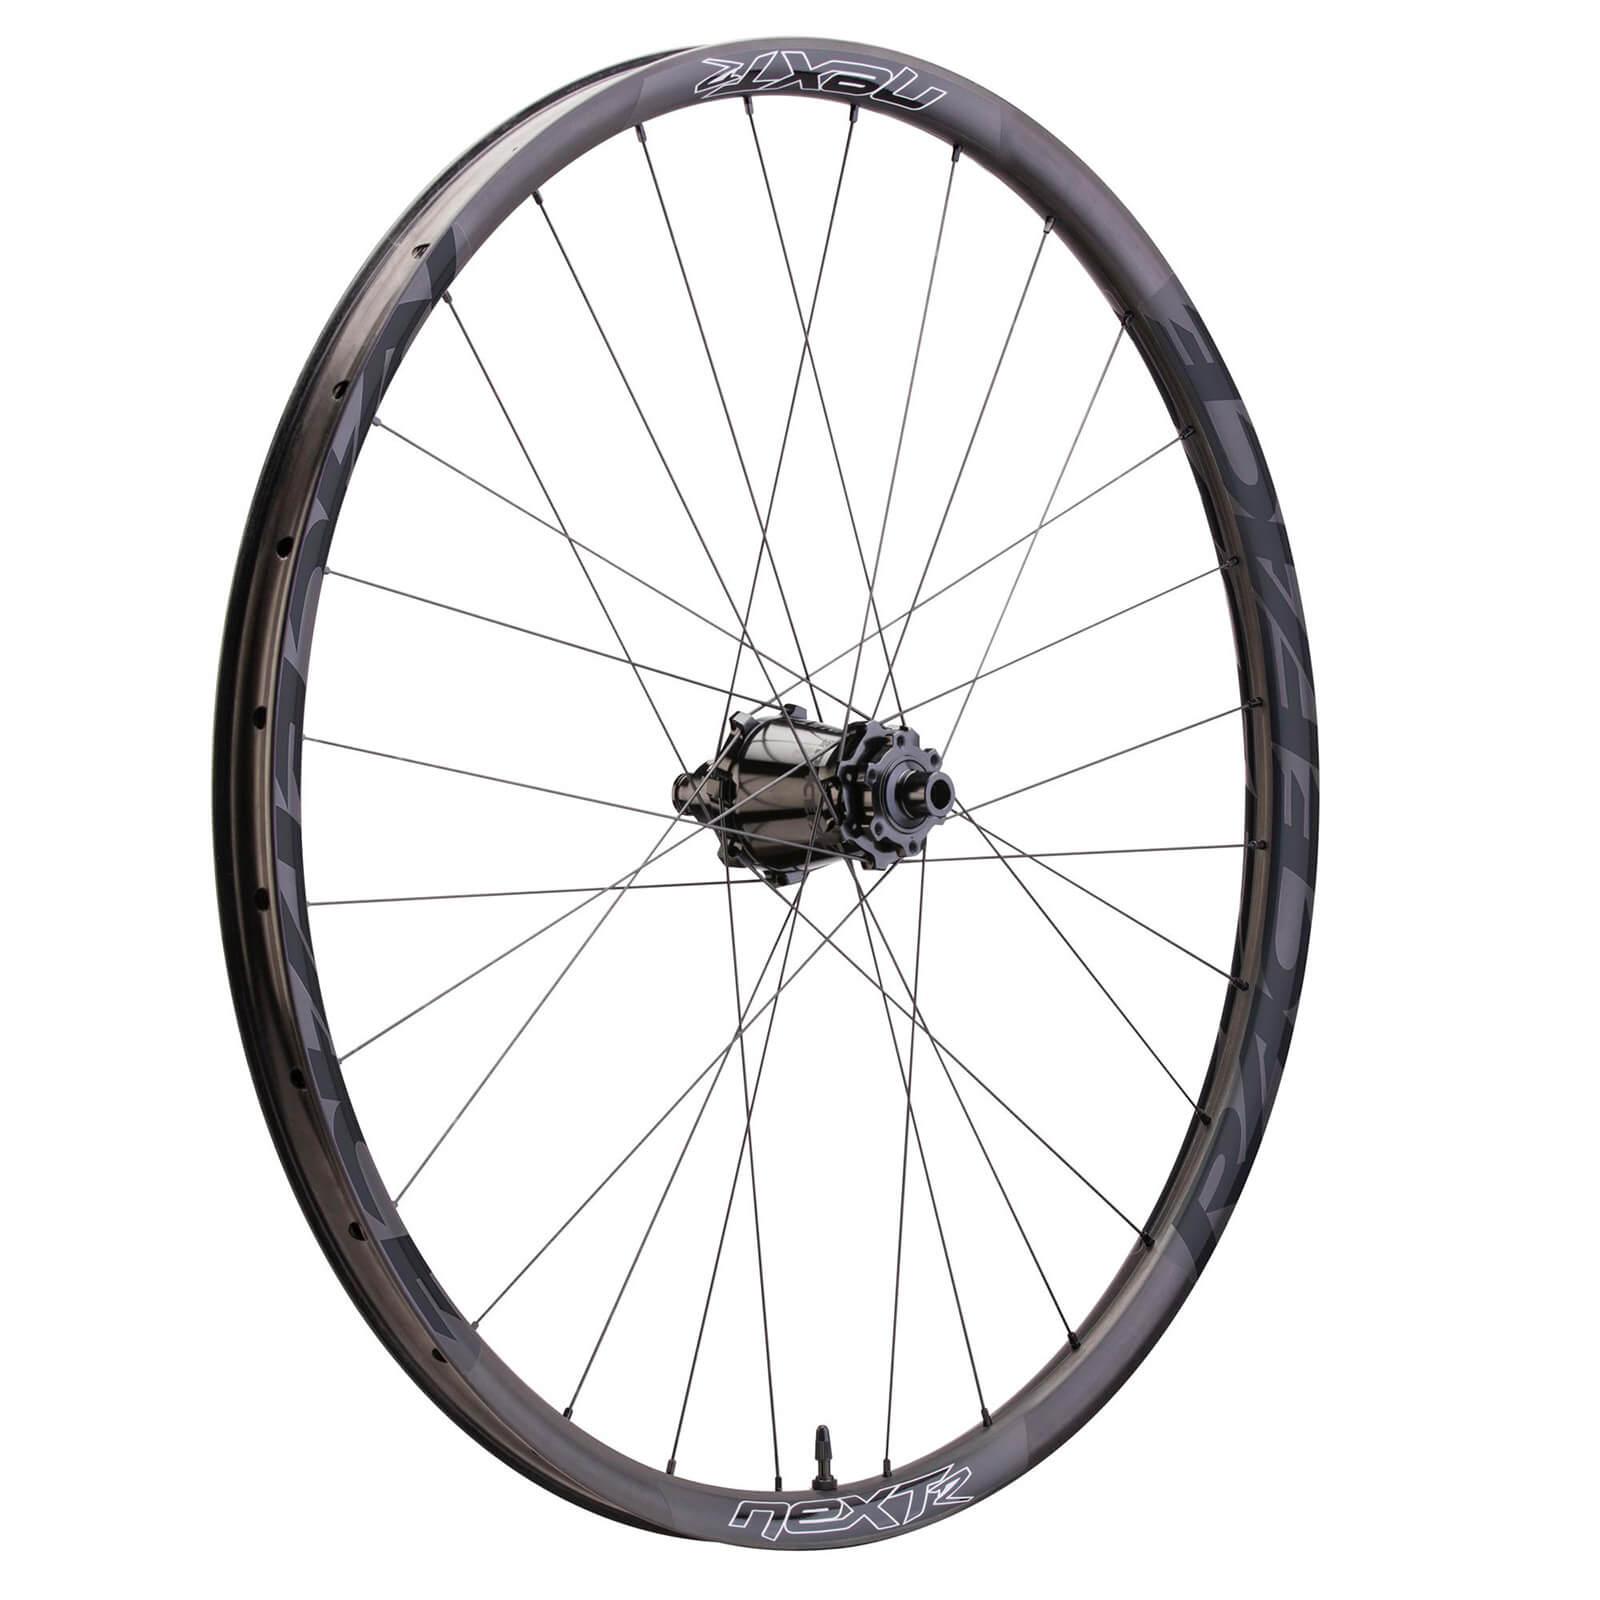 Race Face Next R 31mm Boost MTB Carbon Rear Wheel - 29 Inch/12 x 148mm - Shimano Microspline